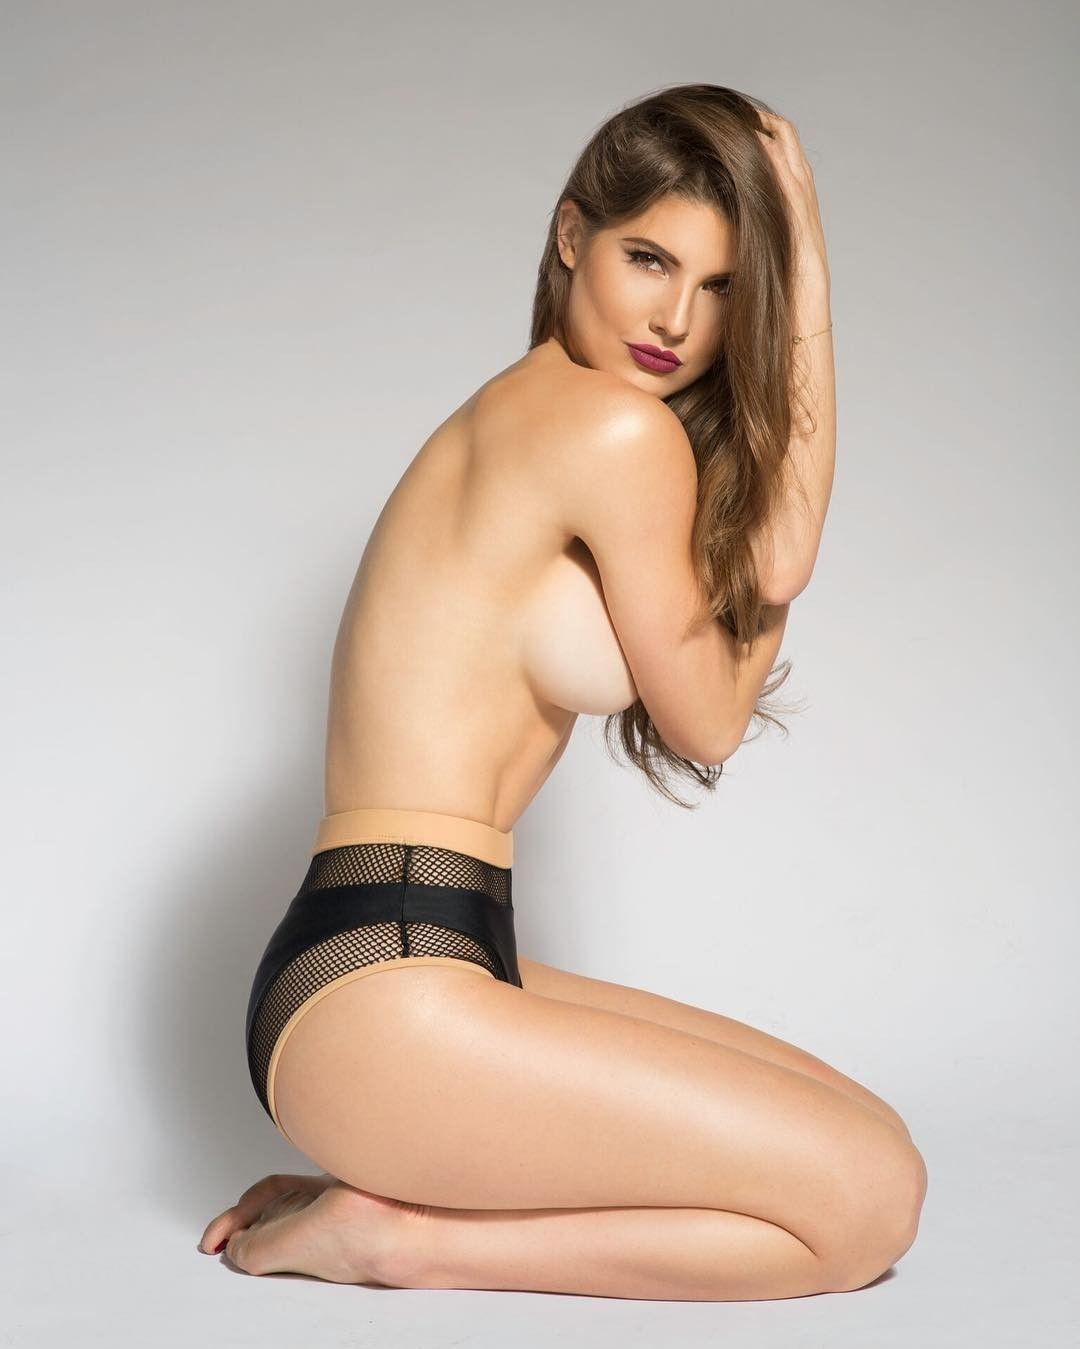 Nude female contest pics